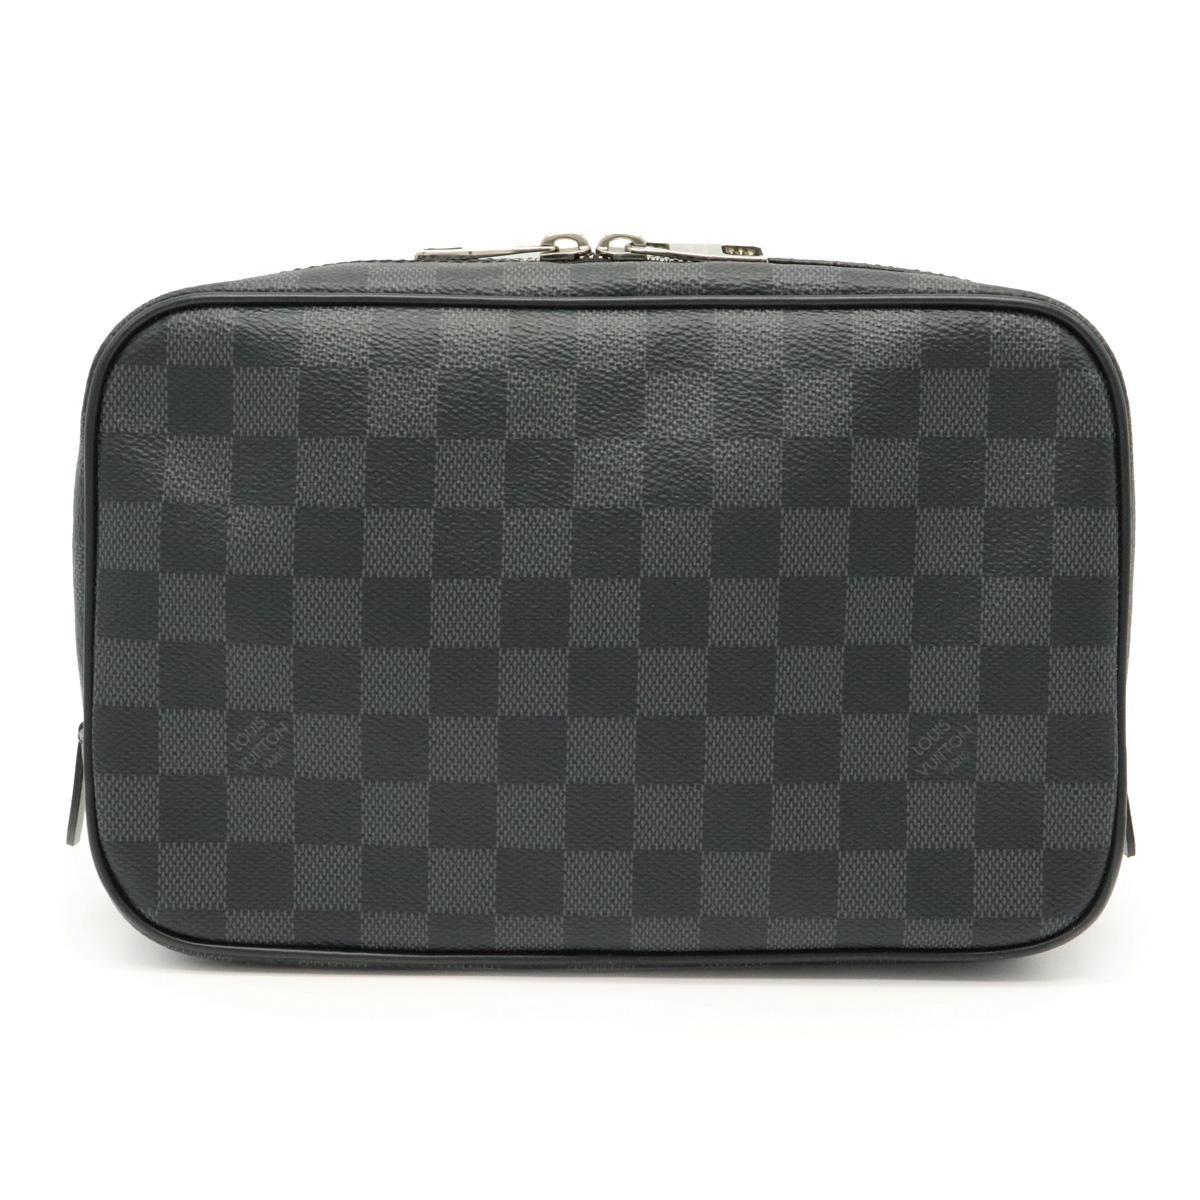 Sランク品 バッグ LOUIS VUITTON セール商品 世界の人気ブランド ルイ ヴィトン ダミエグラフィット トゥルース 化粧ポーチ トワレGM セカンドバッグ 中古 小物入れ N47521 ポーチ